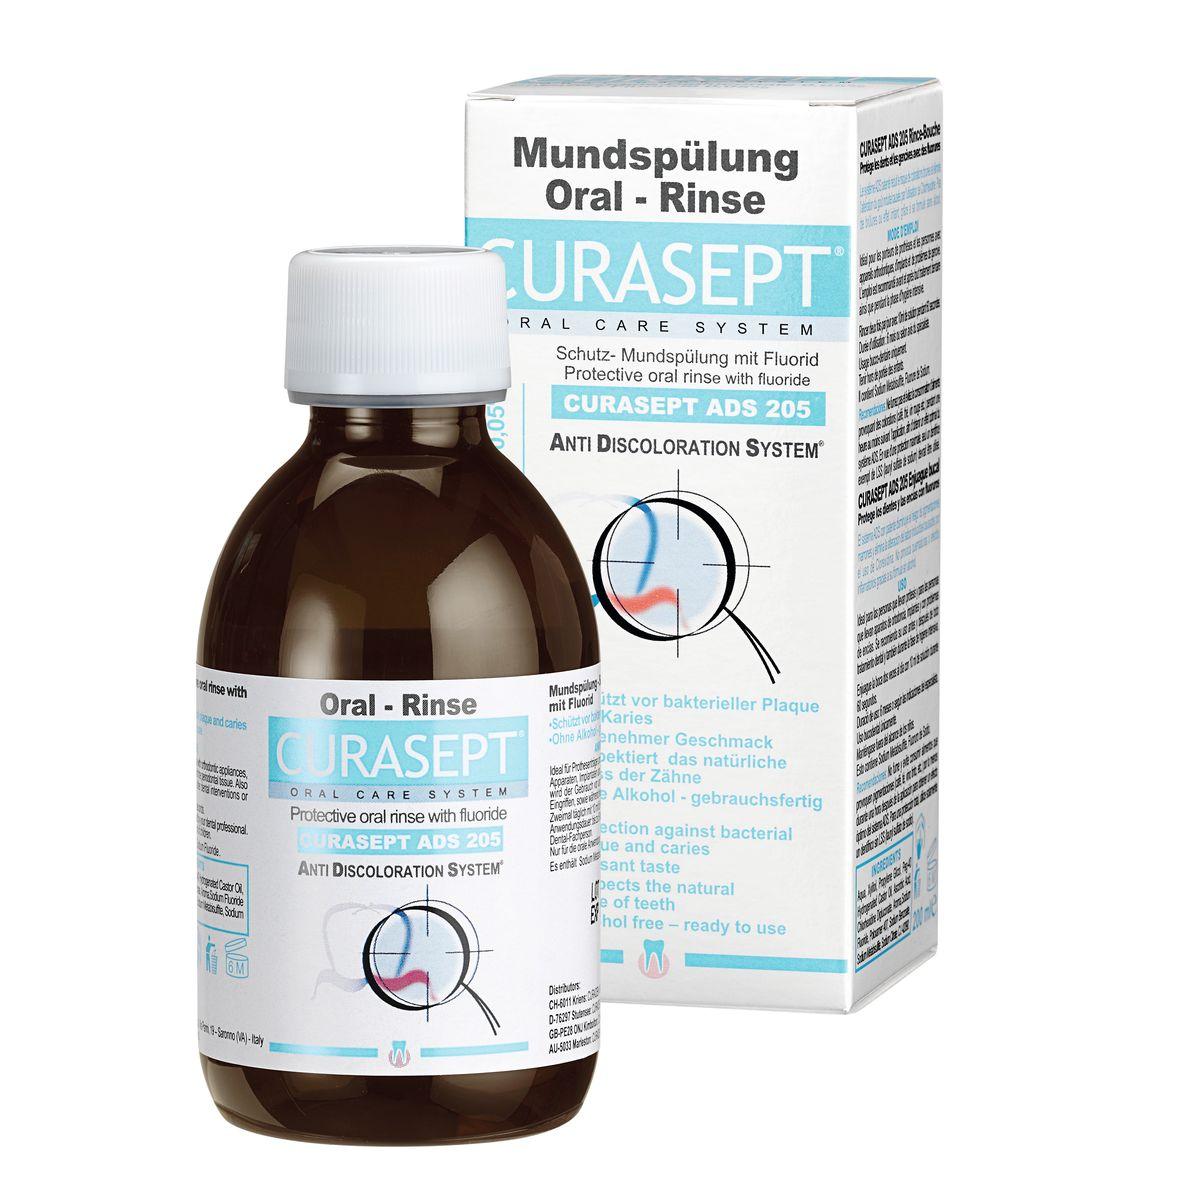 Curaden ADS 205 Жидкость-ополаскиватель, 0,05% хлоргексидина (200 мл)